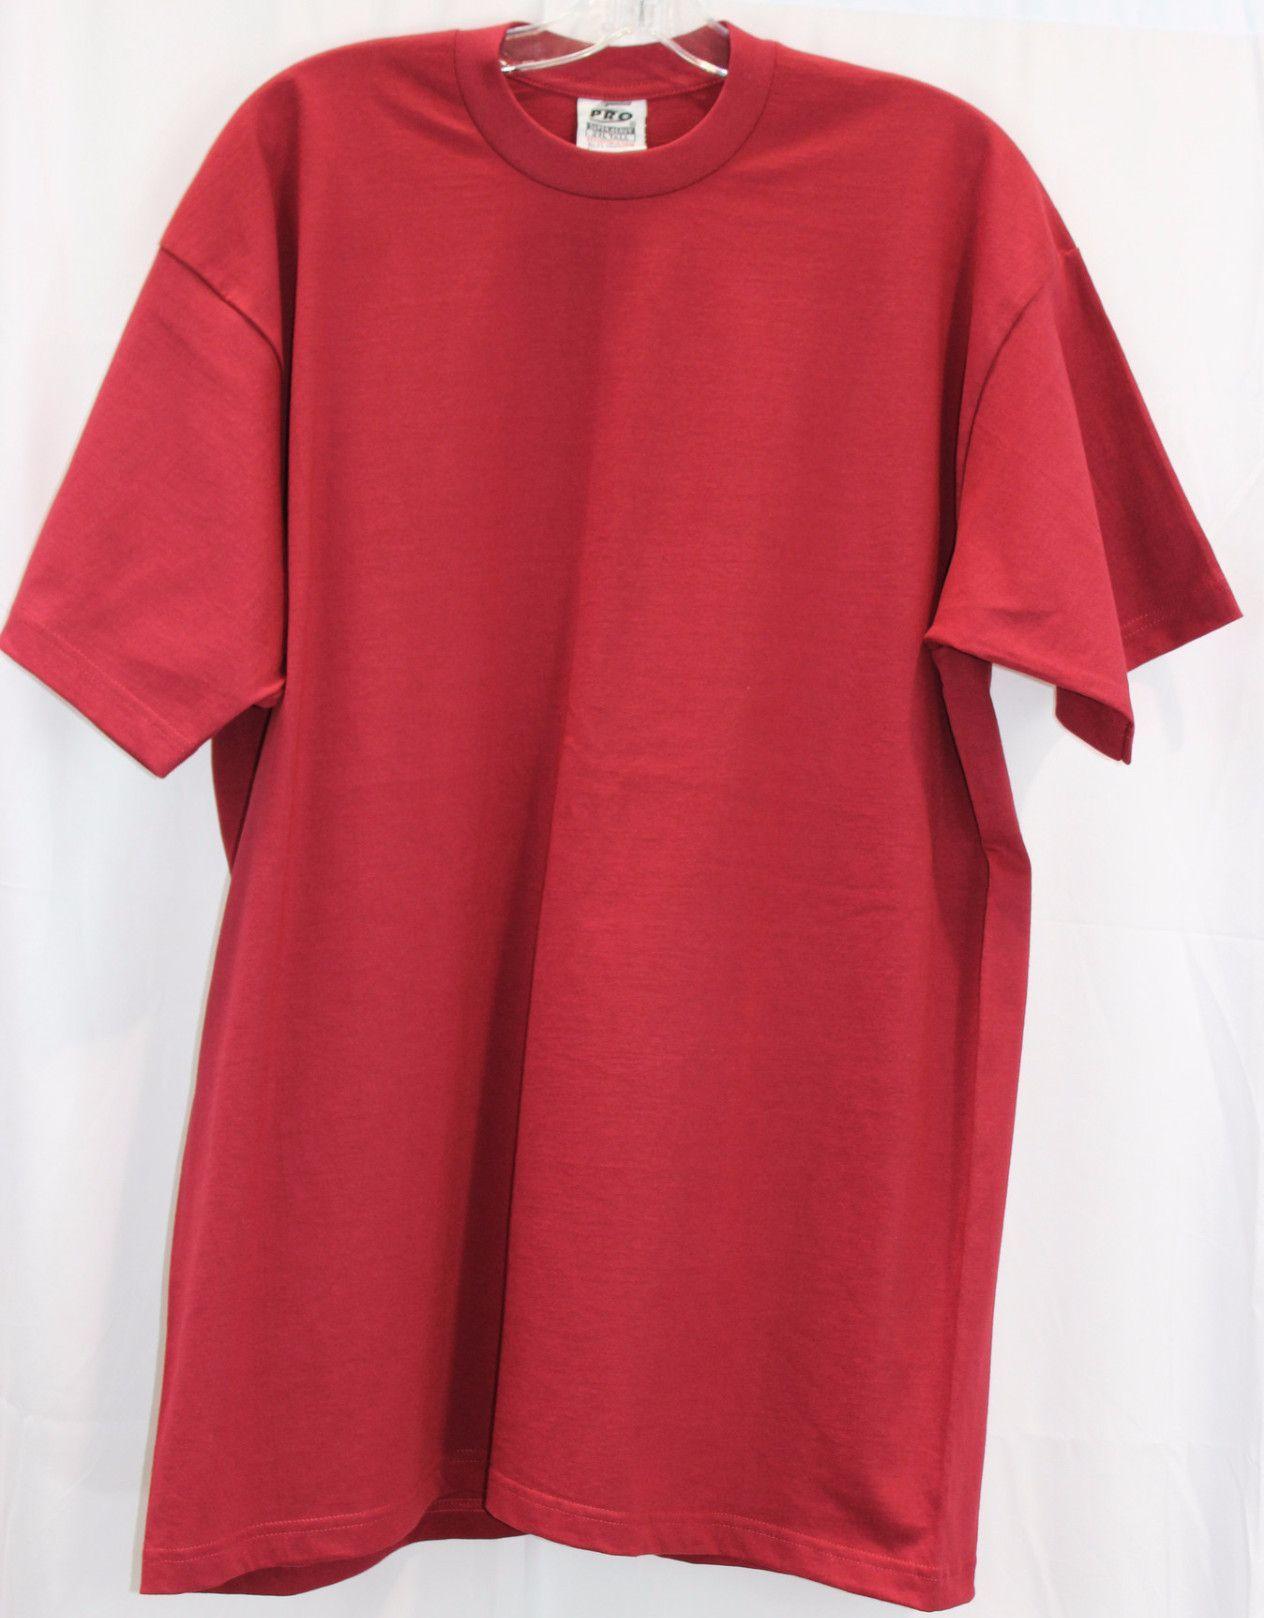 9968cbe9 **ALL COLORS, TALL & REGULAR SIZES** Pro 5 Super Heavy No Pocket Short  Sleeve BIG MENS T-Shirt